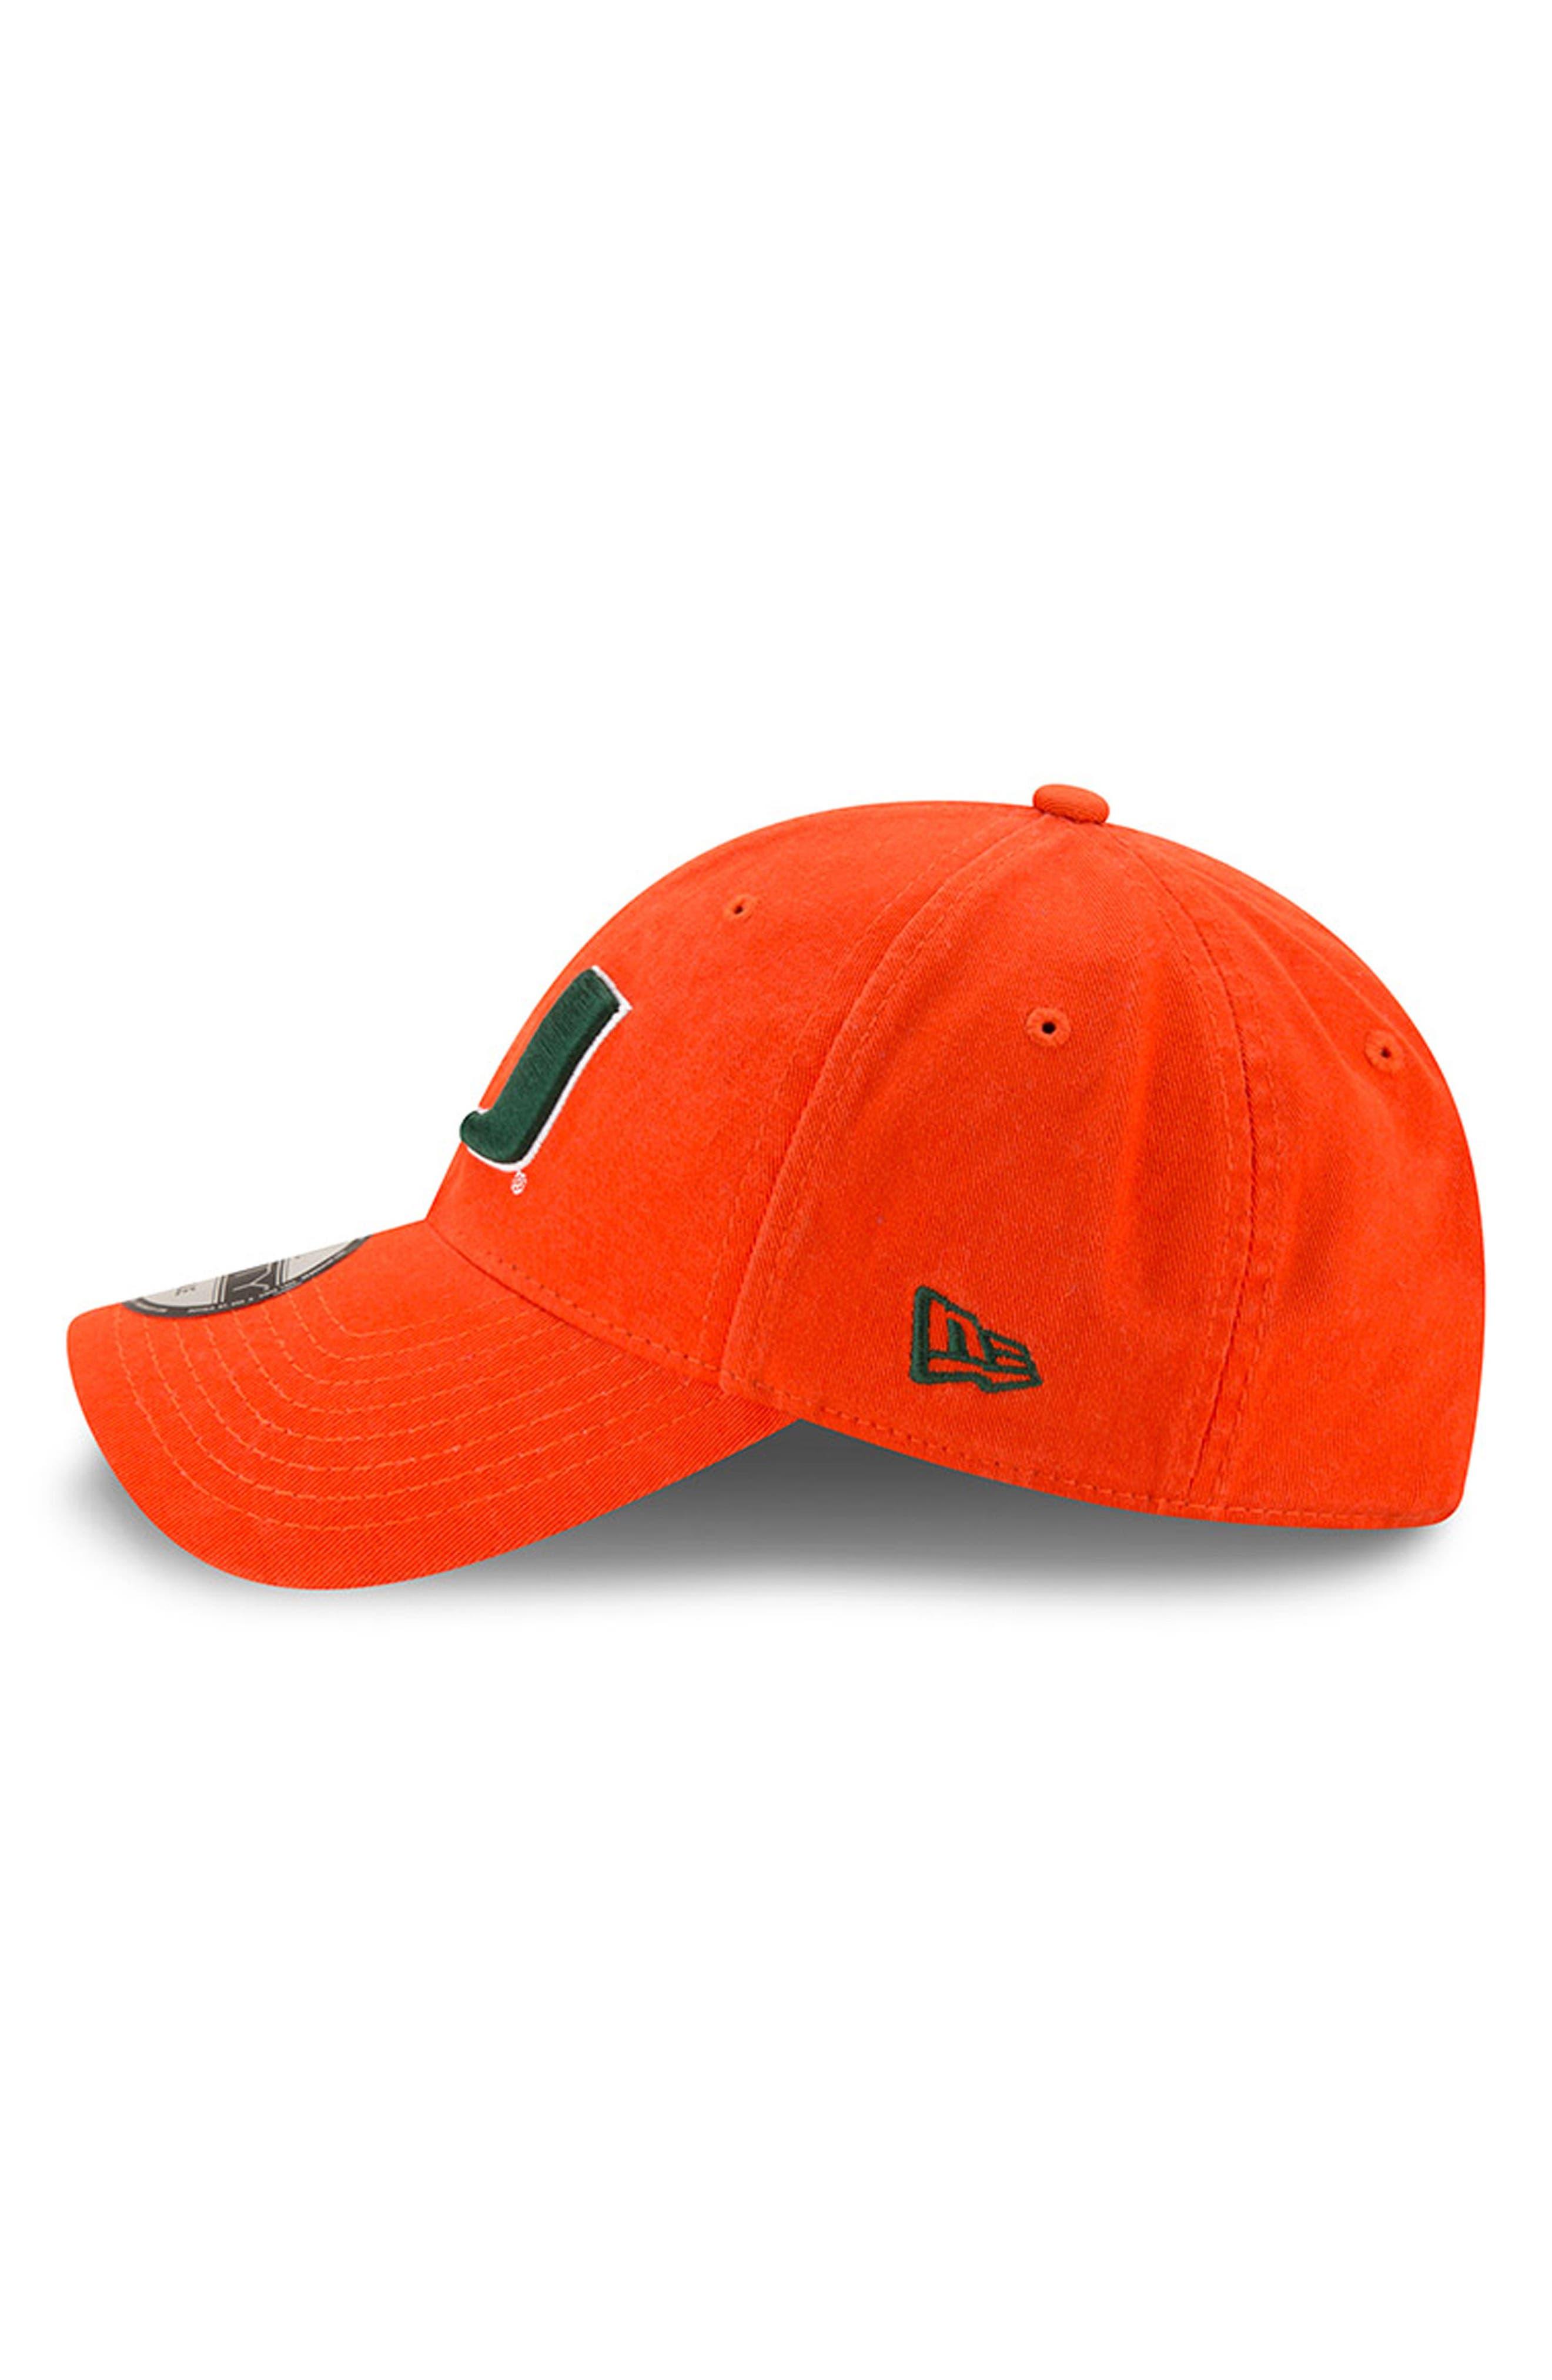 New Era Collegiate Core Classic - Miami Hurricanes Baseball Cap,                             Alternate thumbnail 4, color,                             Miami Hurricanes